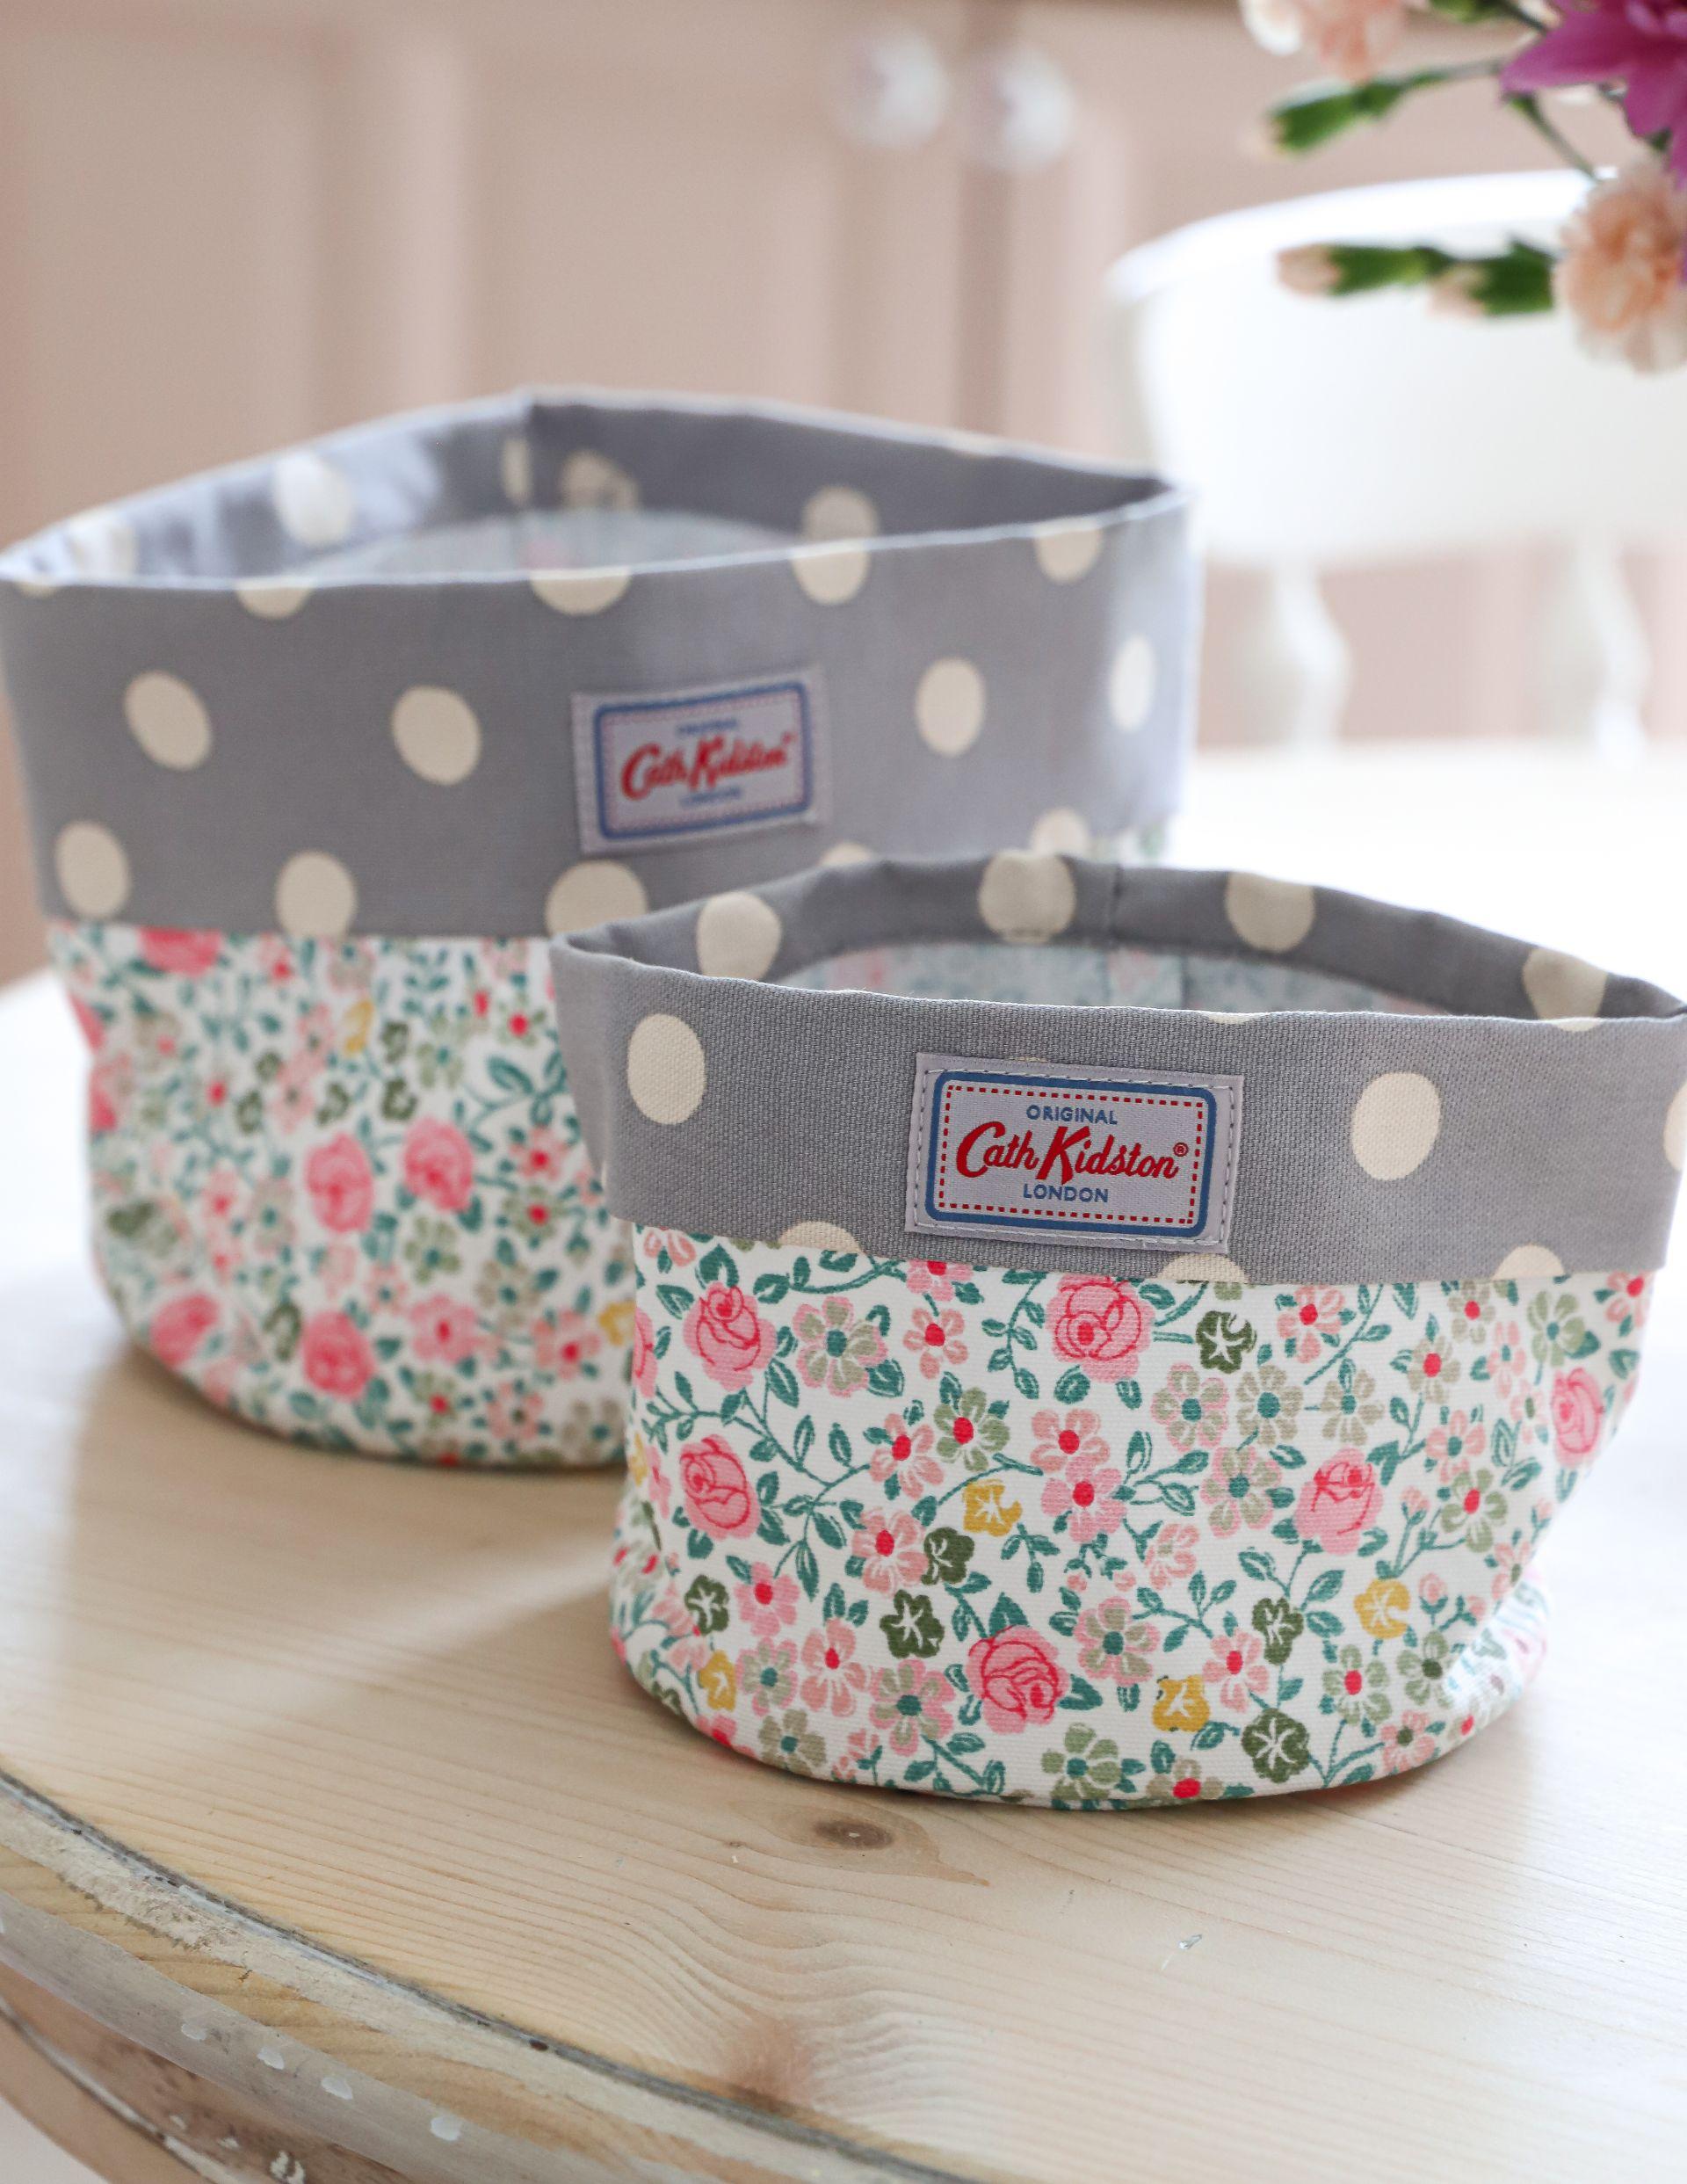 Cath Kidston storage baskets